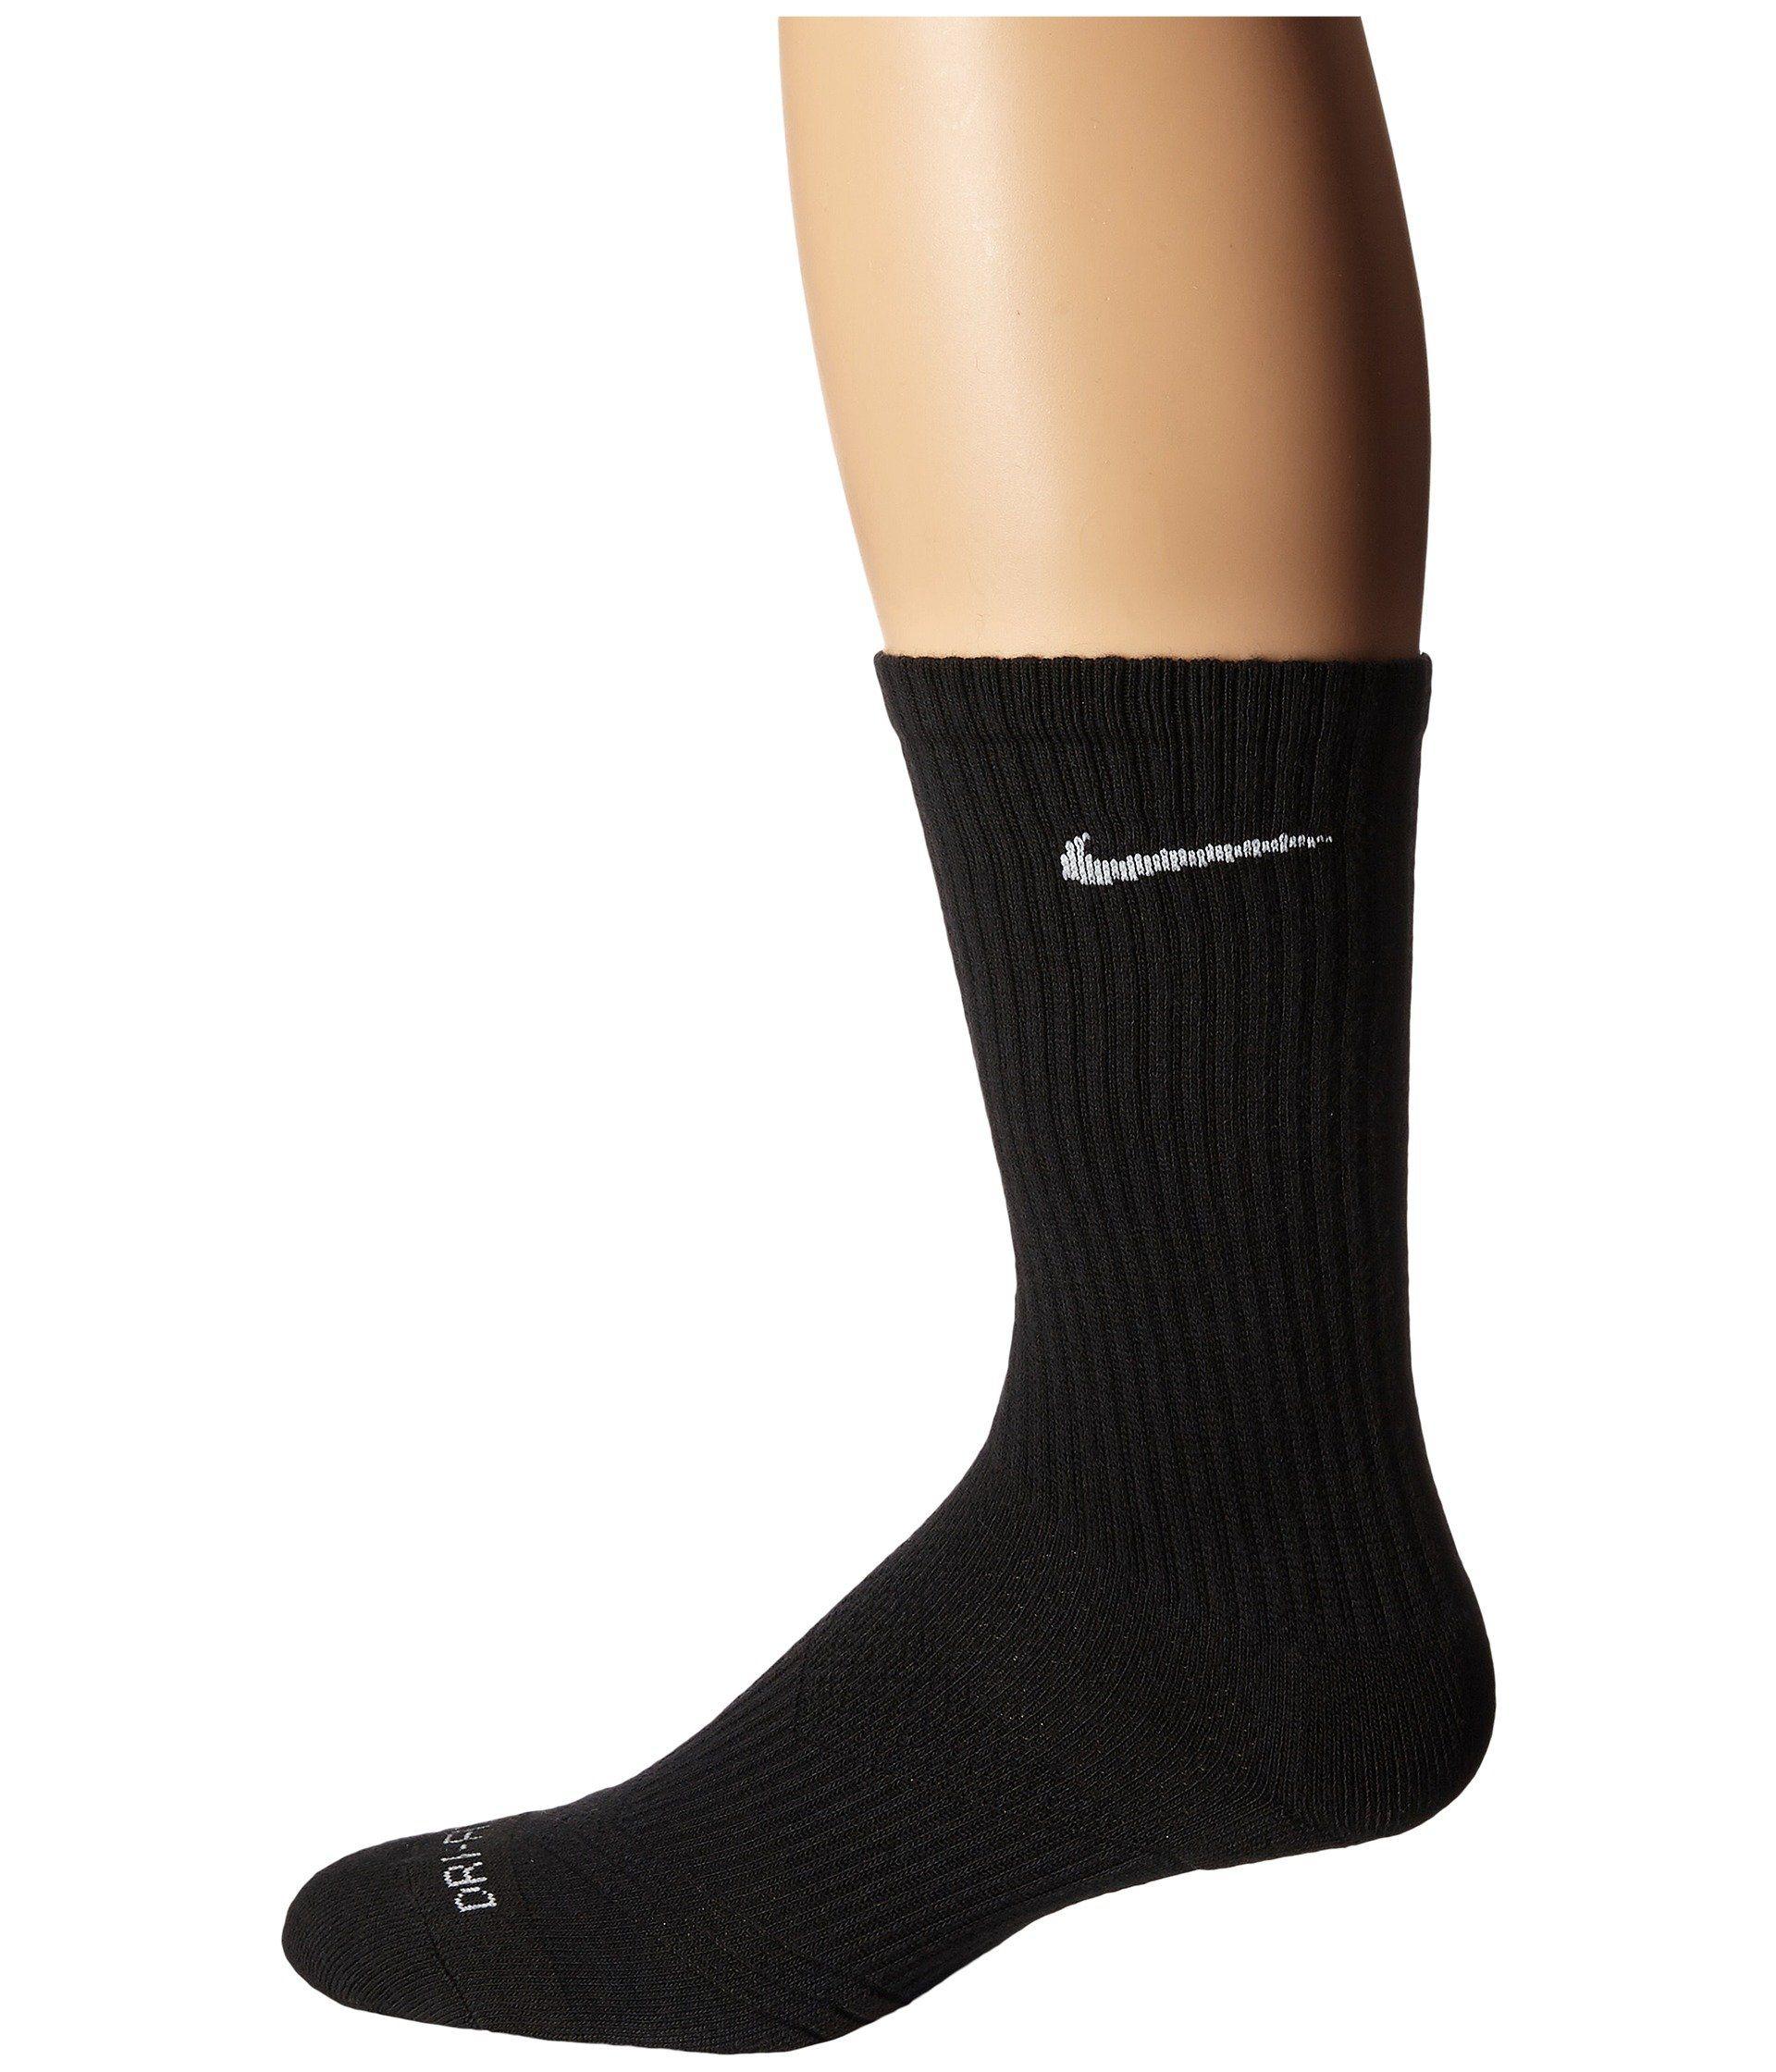 07e4bb061240d Nike Women's Dri-Fit Cushion Crew 3-Pair Pack at Amazon Women's ...